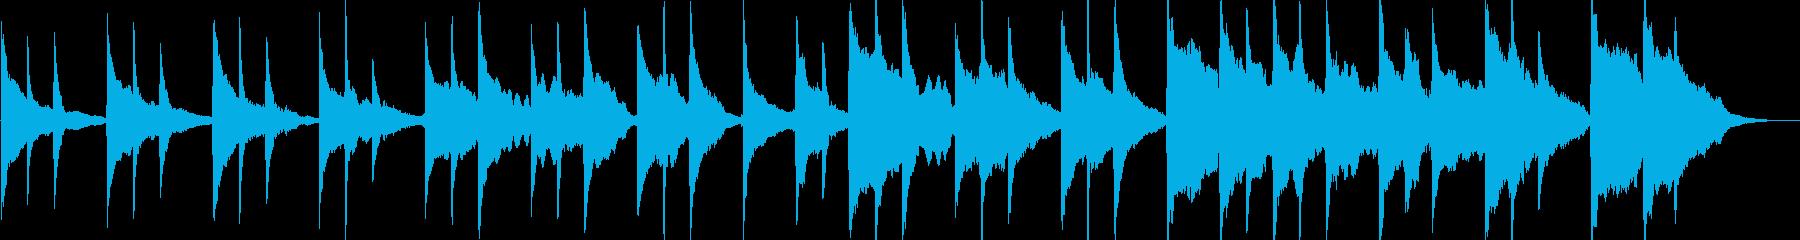 Piano Thriller の再生済みの波形